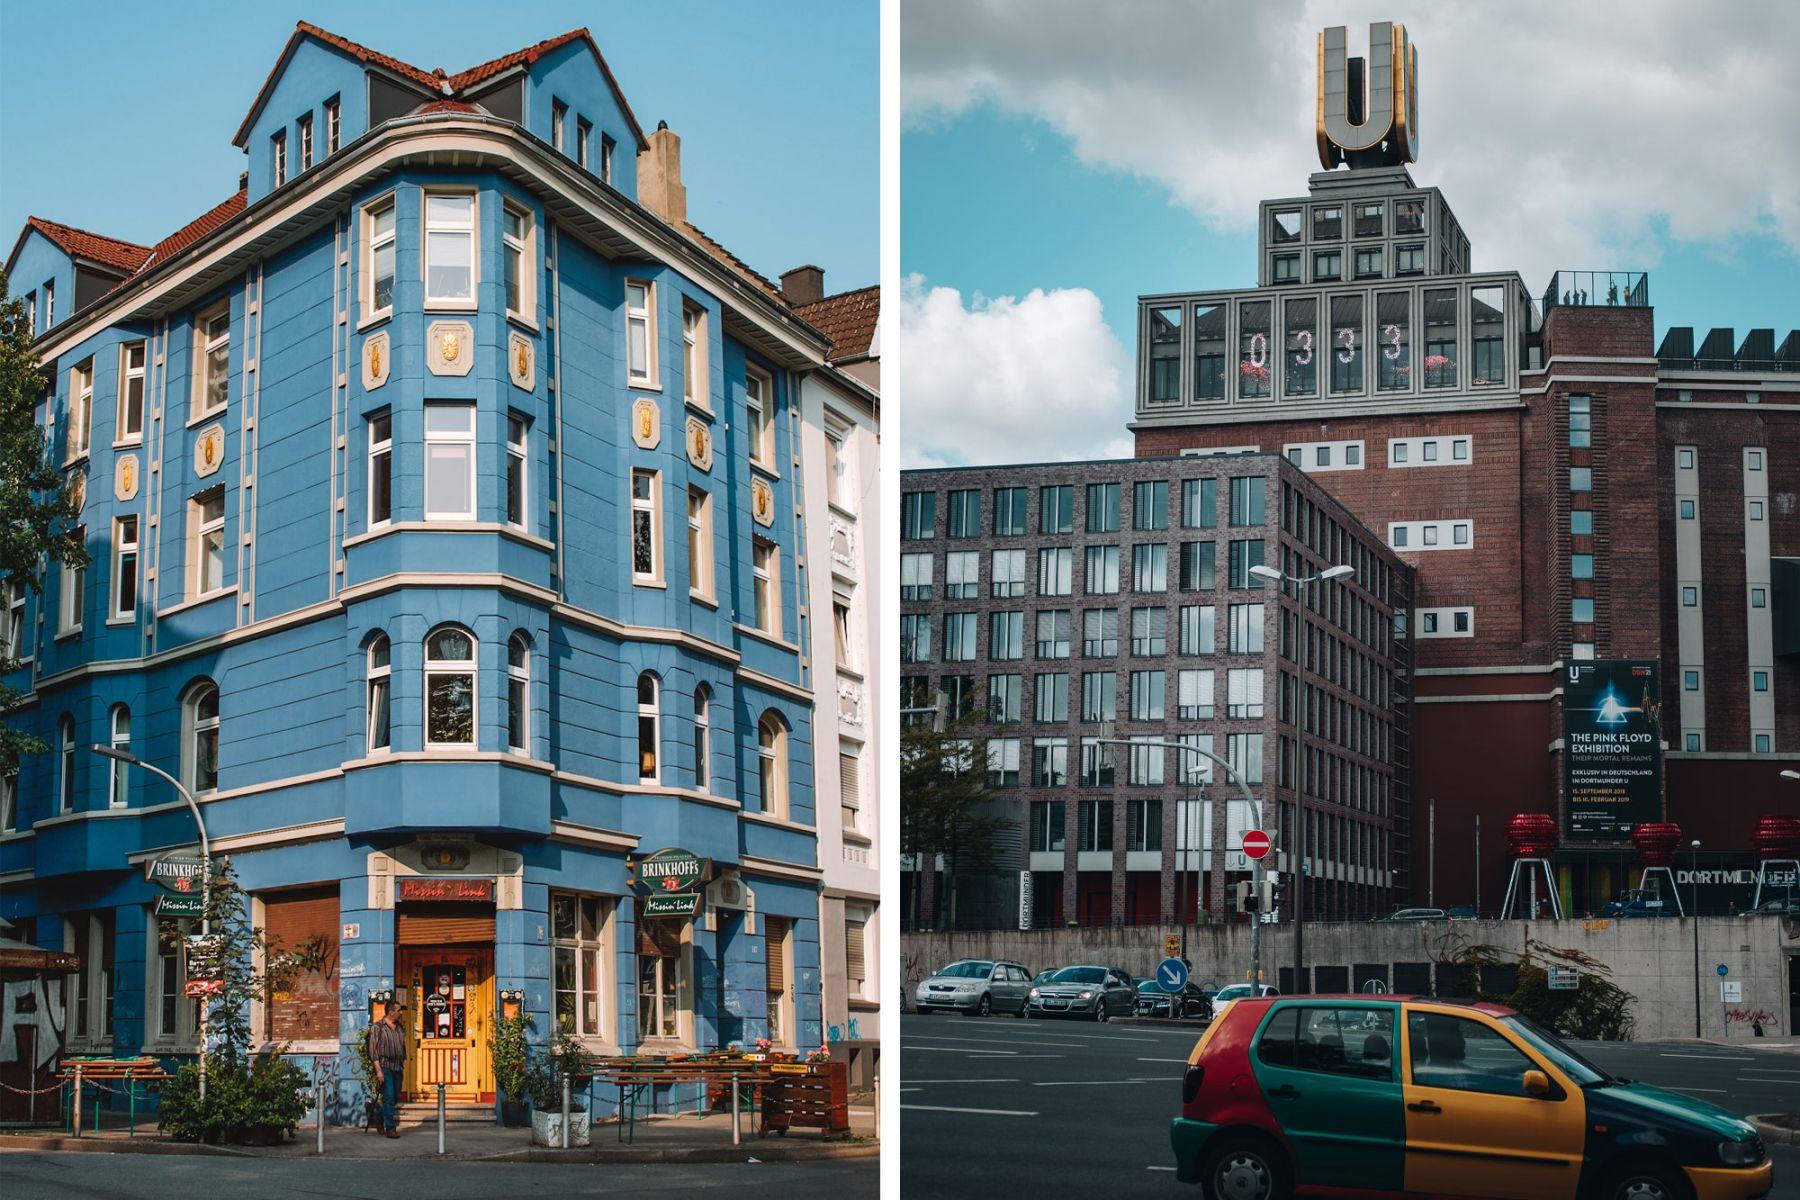 Foto van Kreuzviertel in Dortmund, en het museum Dortmunder U | Credits: Wanderlust.nl & Carsten Behle